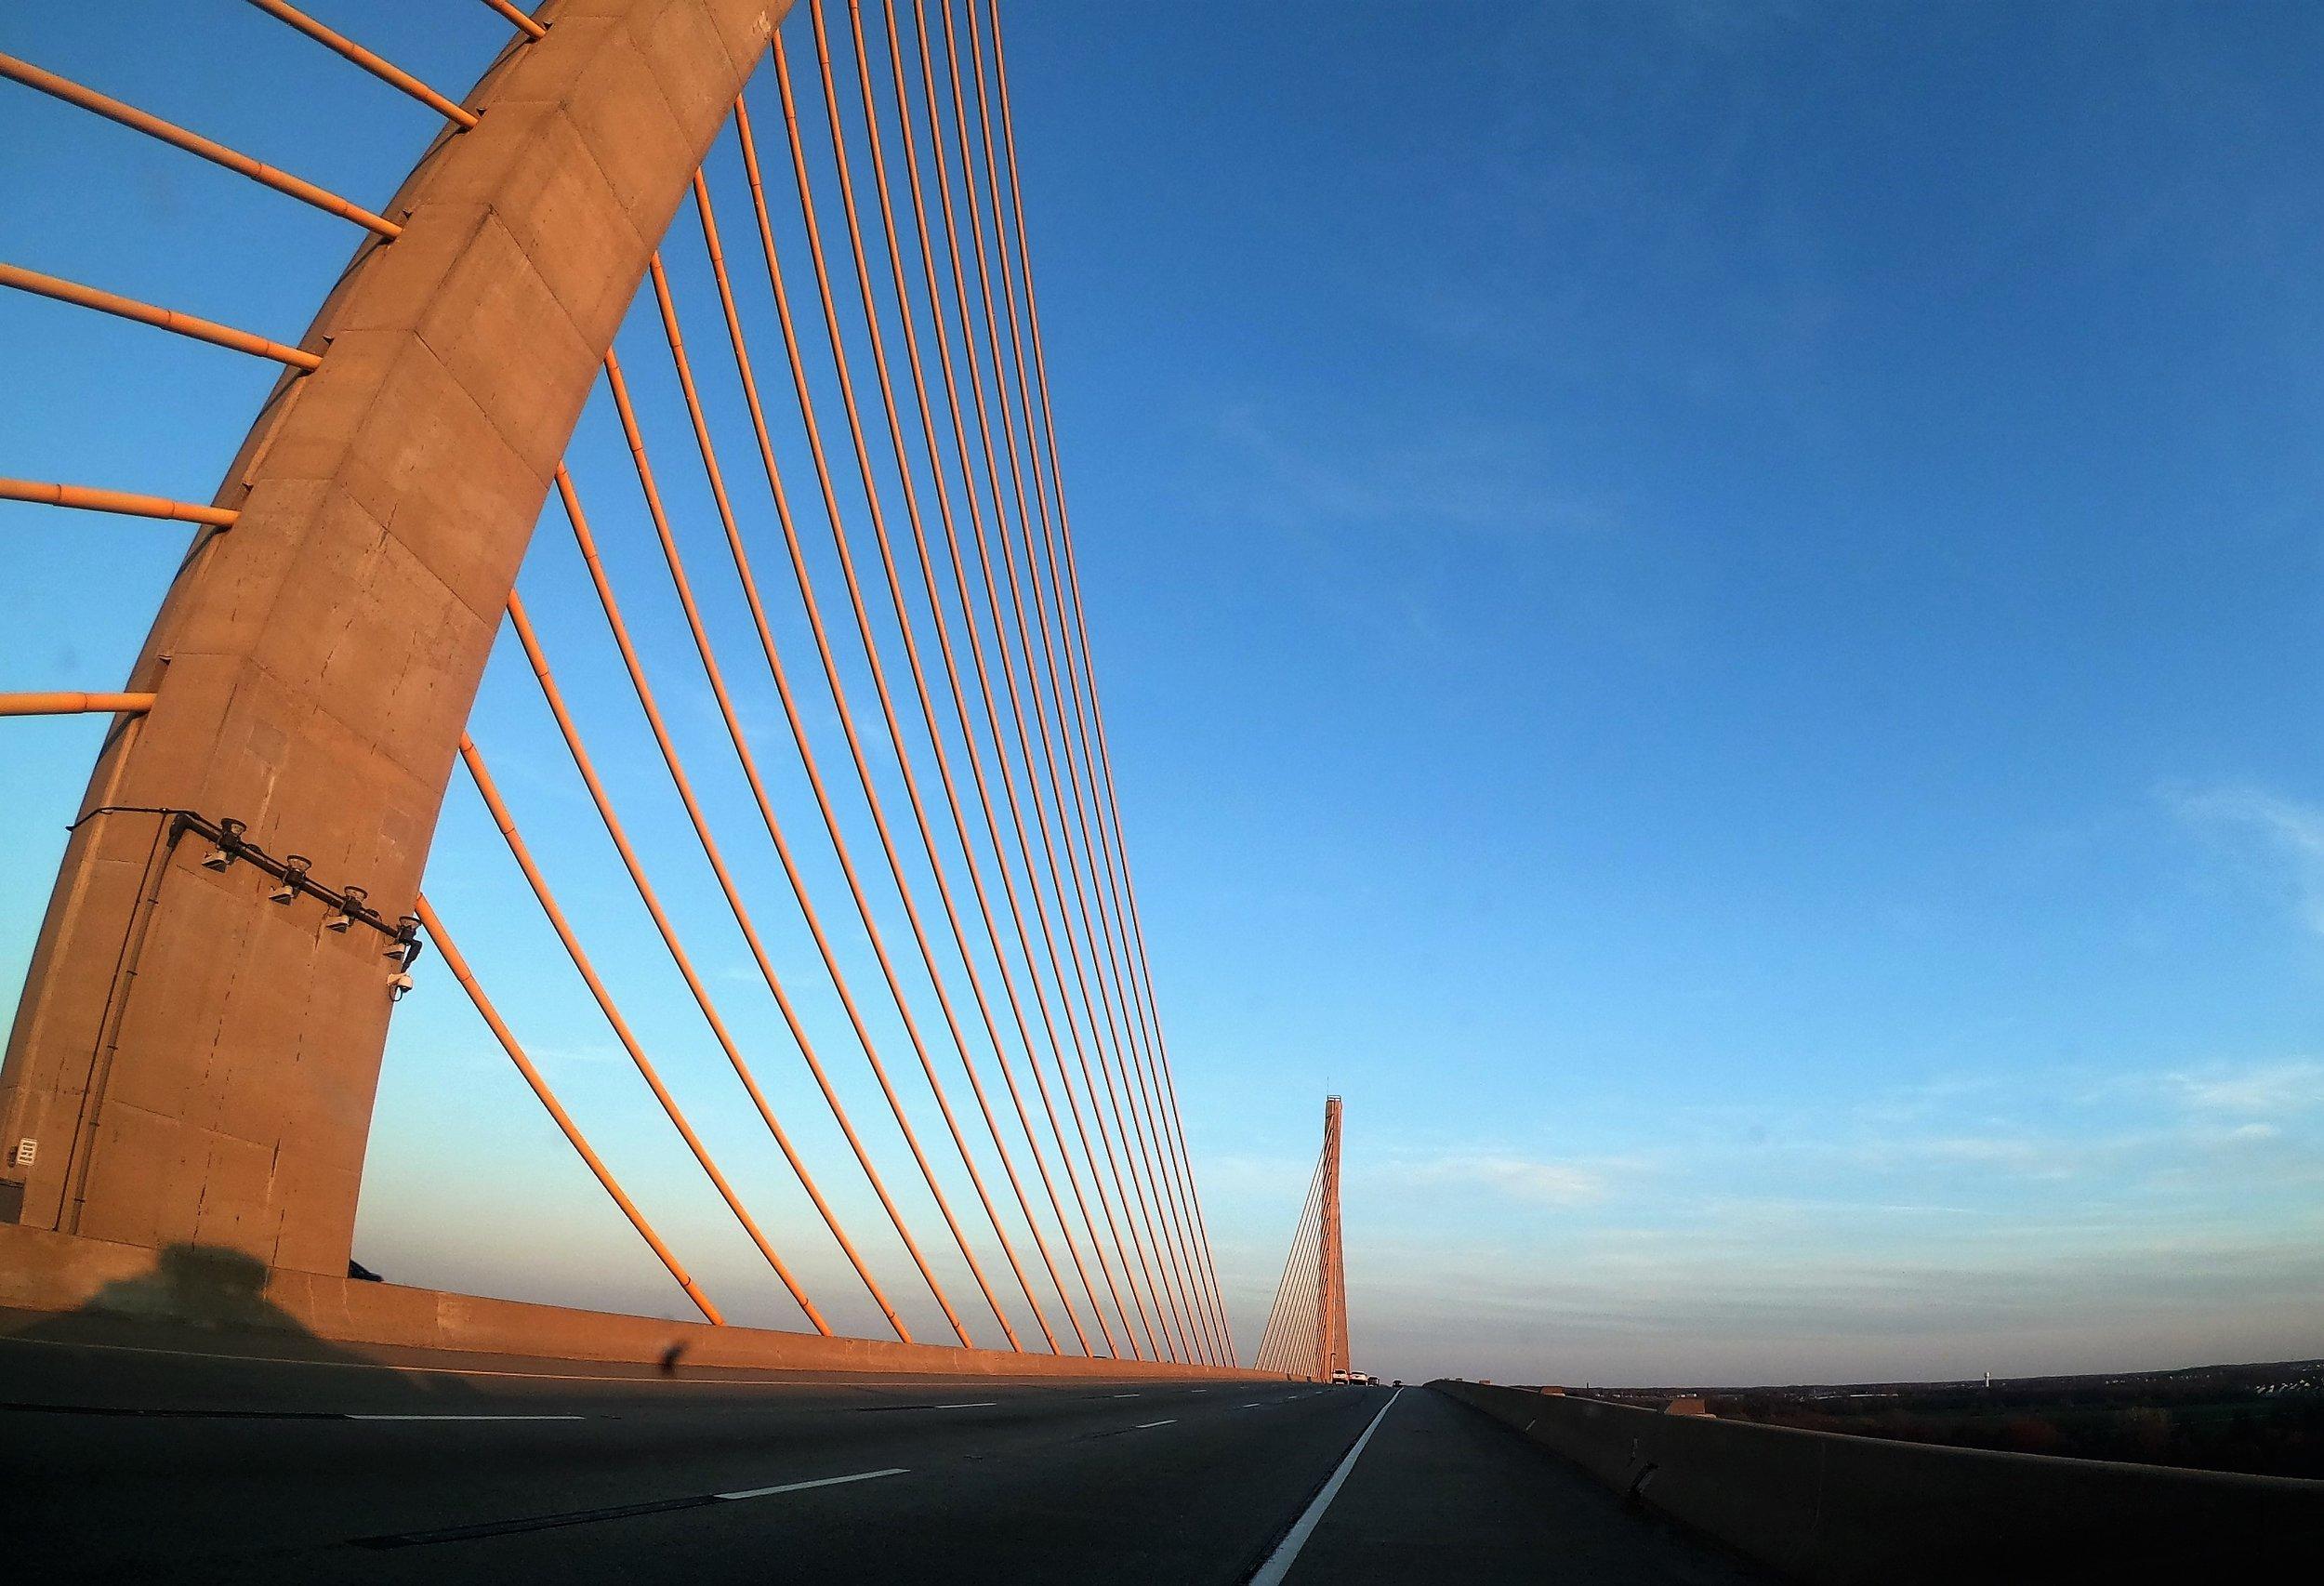 William V. Roth Jr. bridge